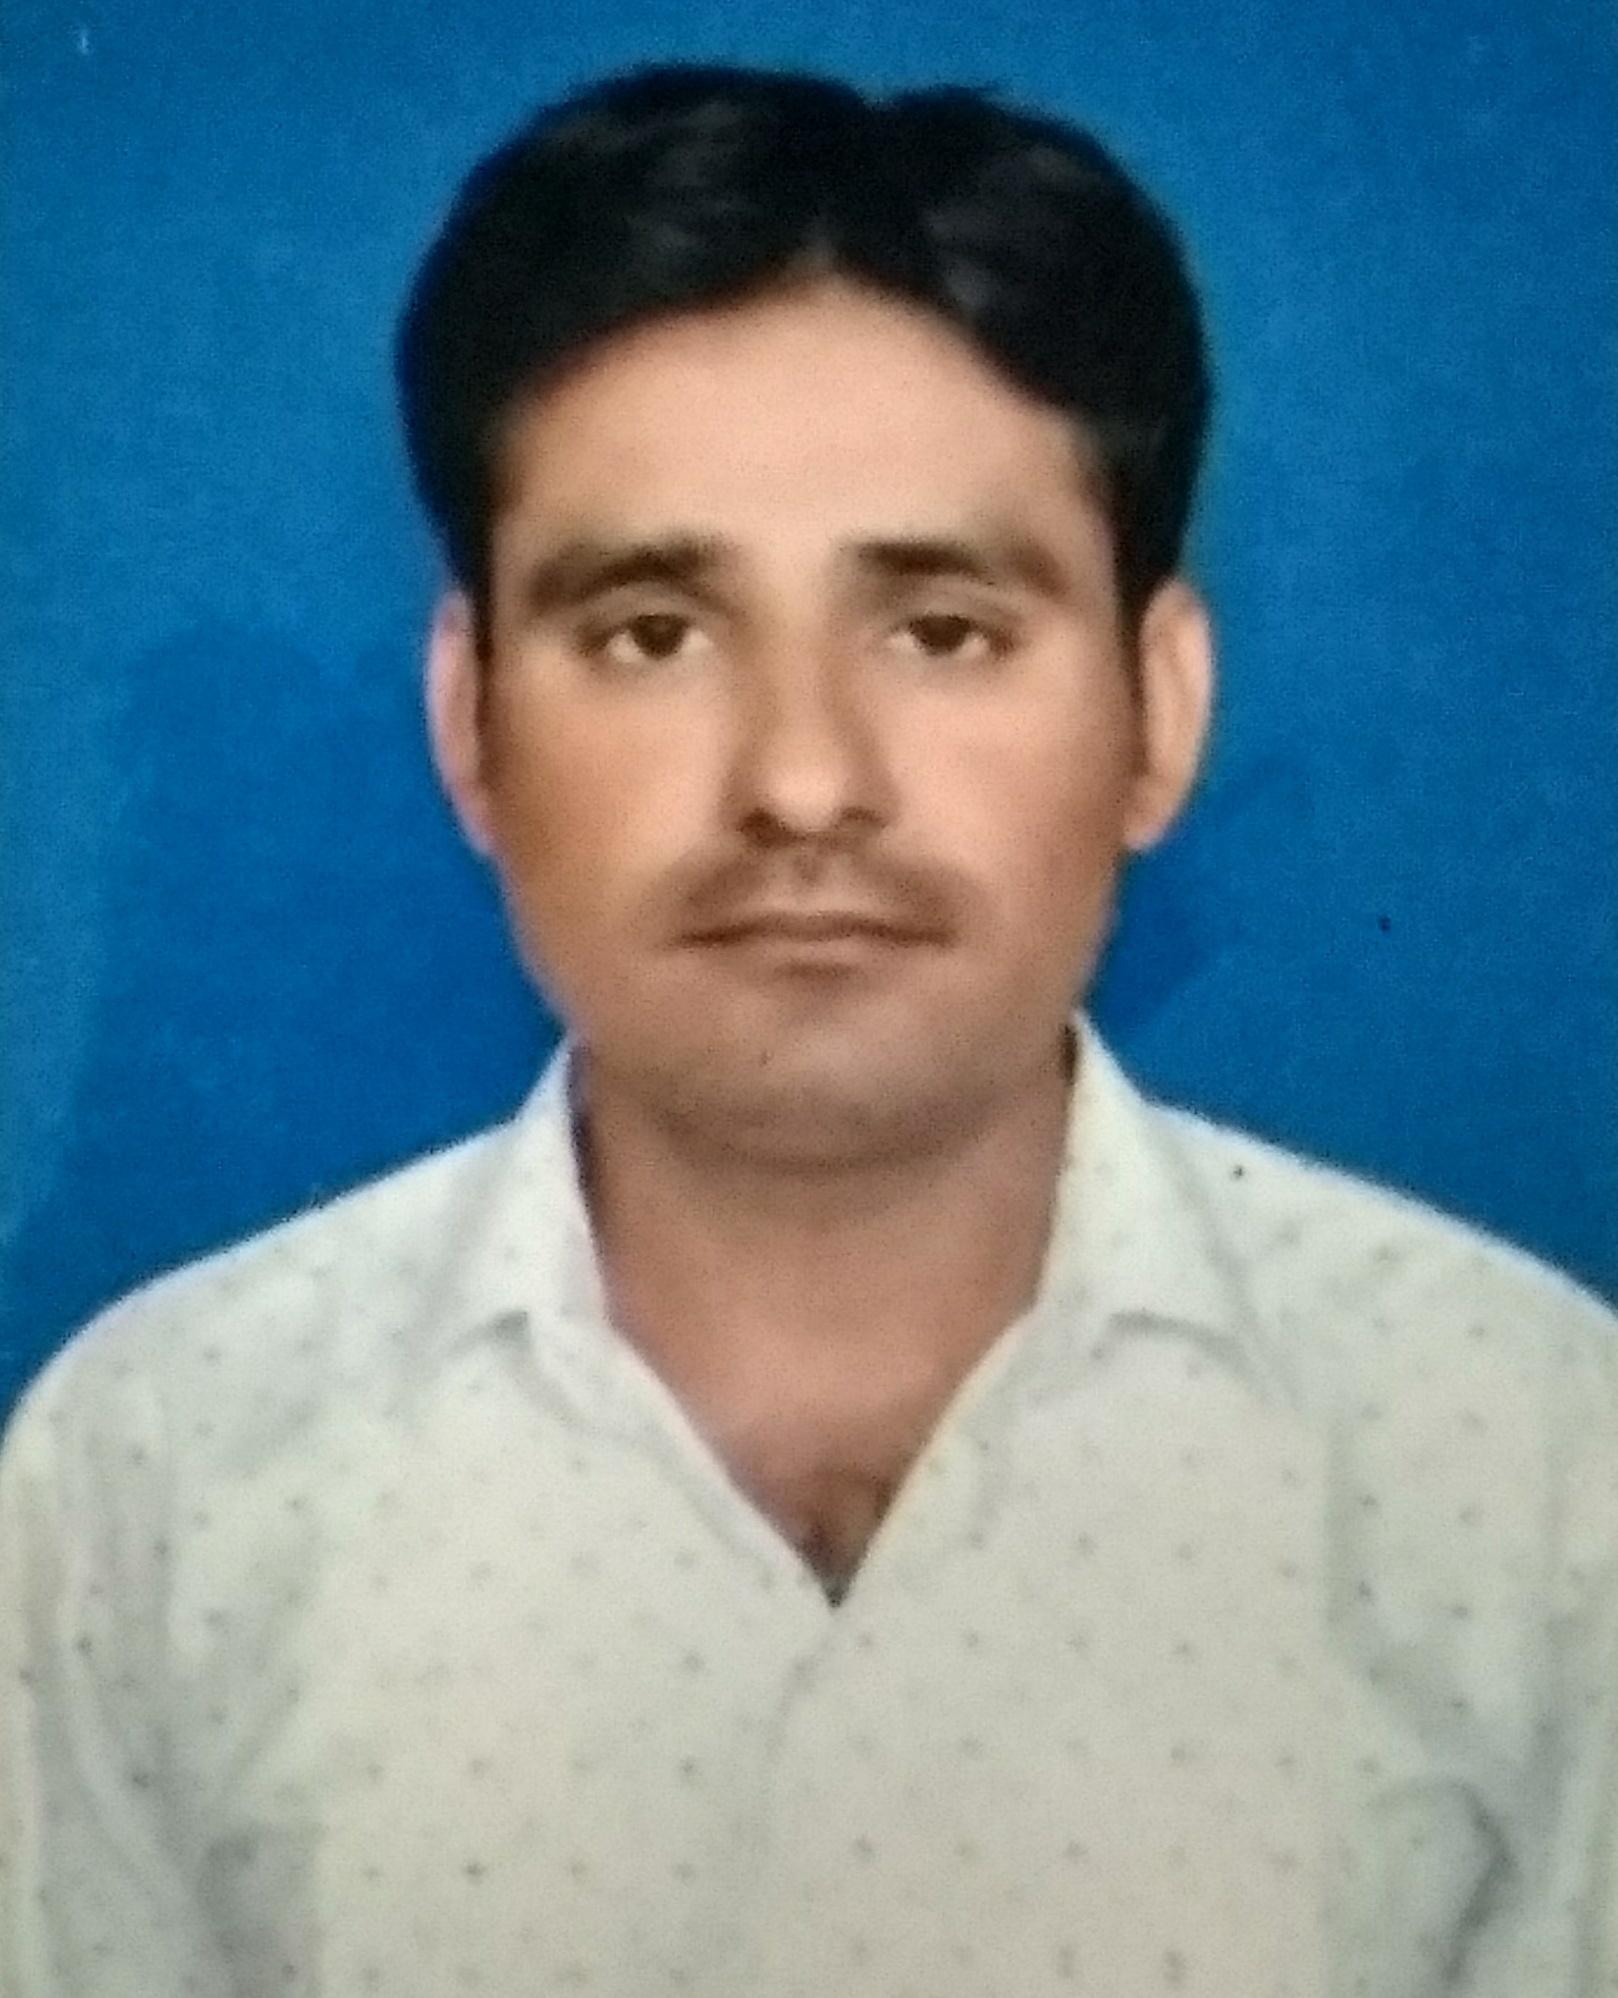 Mr. Rajendra Kumar